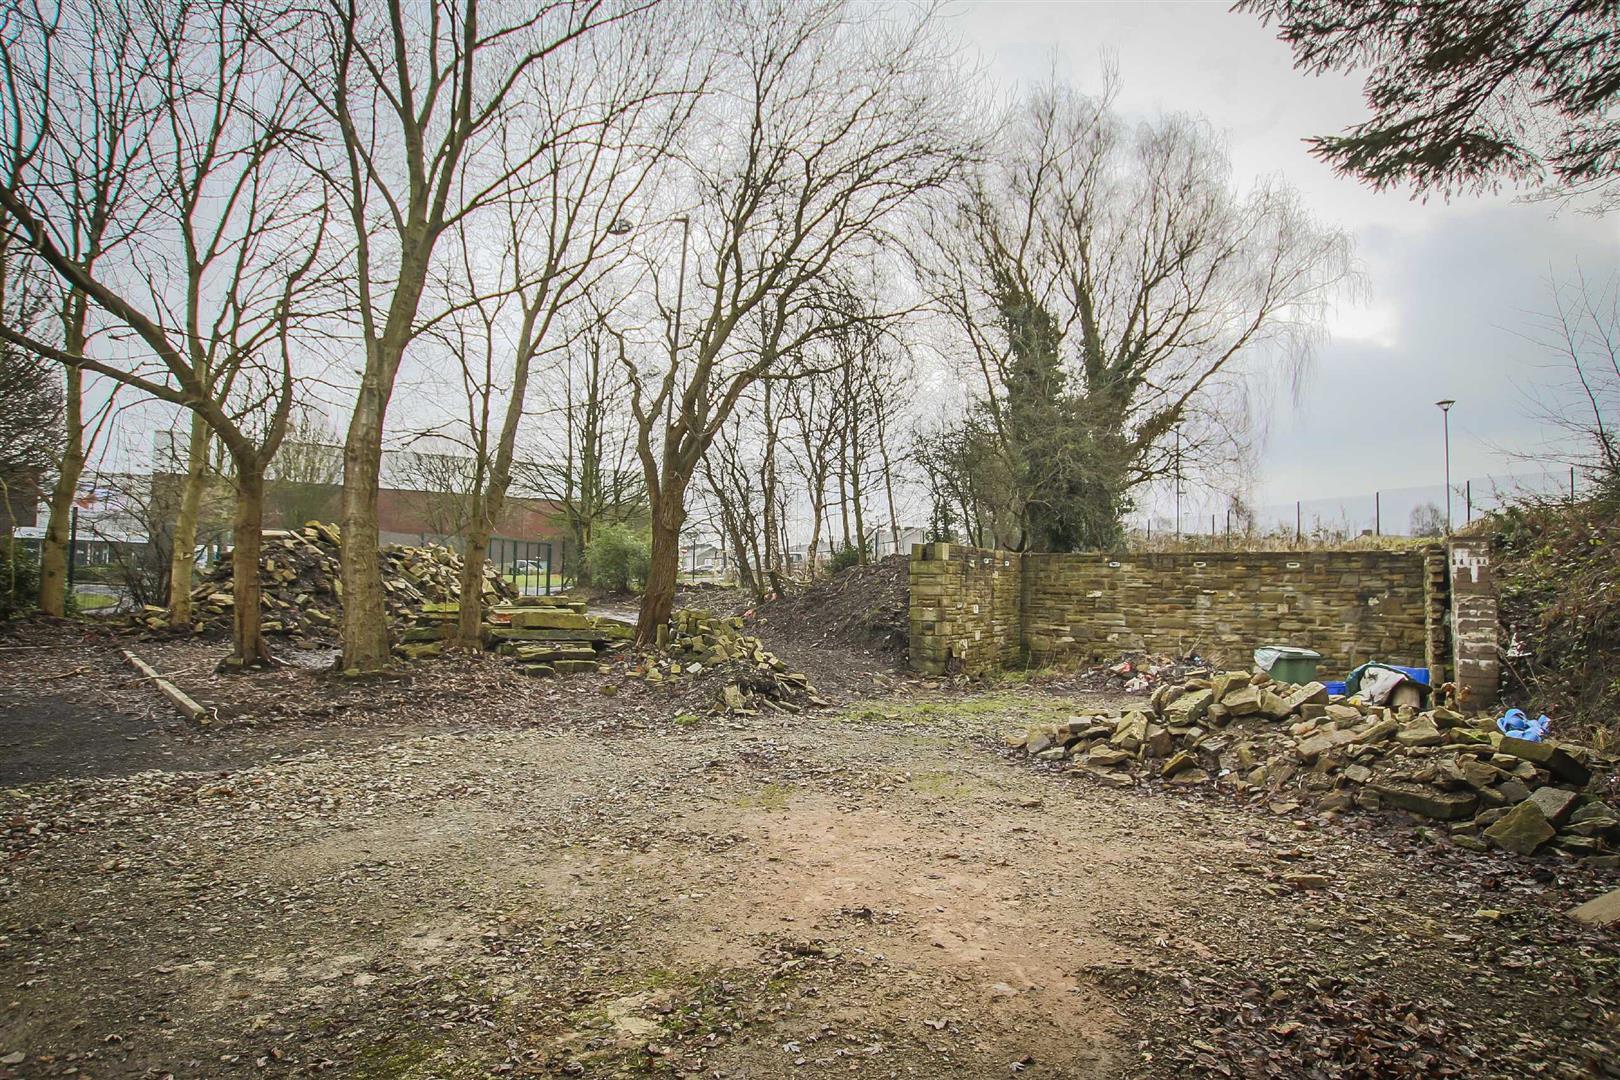 Development Site Land For Sale - p040007_07.jpg